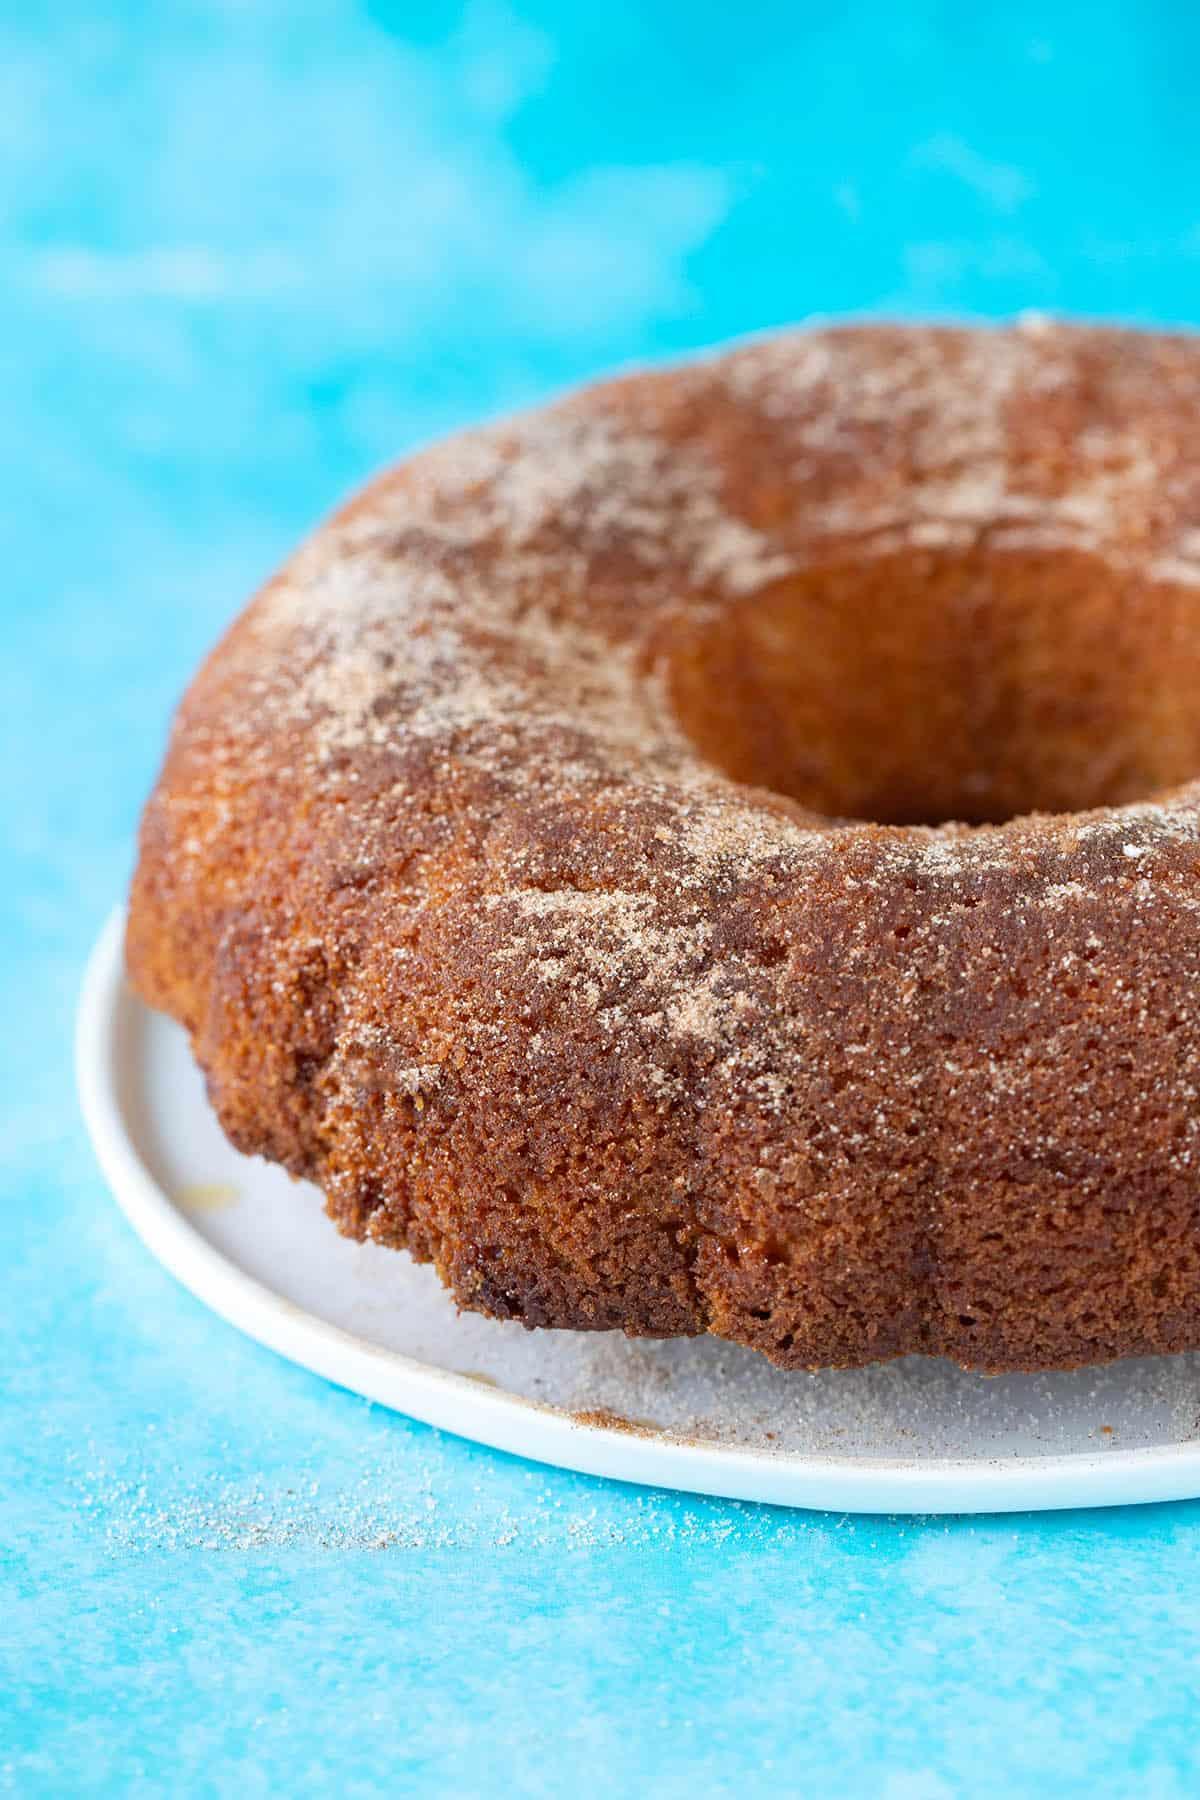 A cinnamon Bundt cake on a blue background